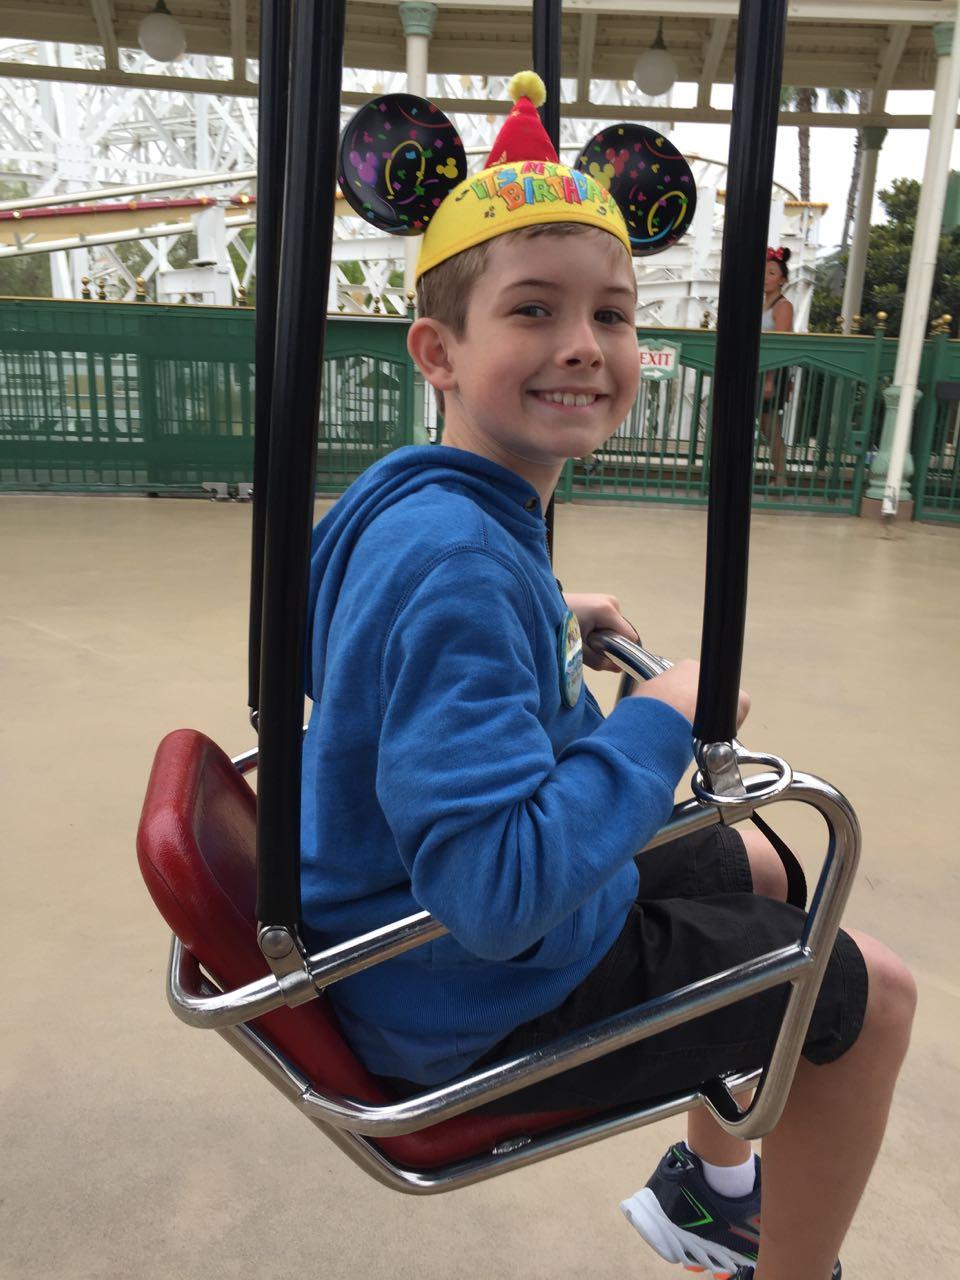 Silly Symphony Swings Disney's California Adventure Park